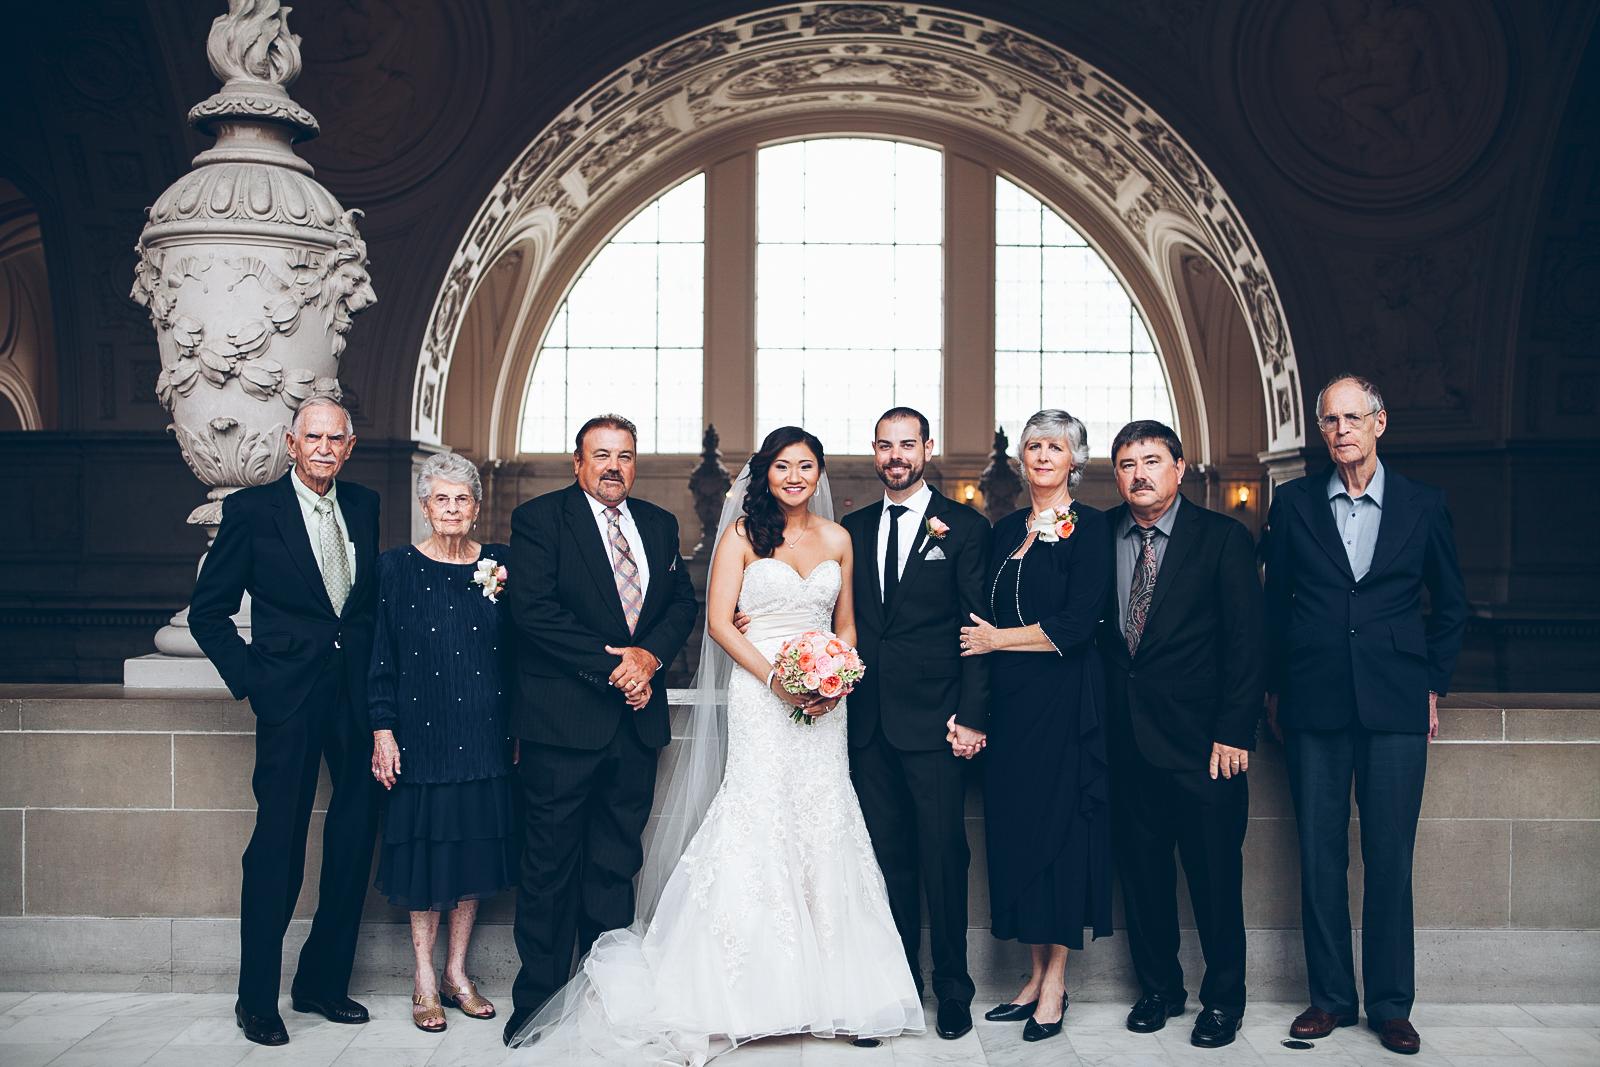 San_francisco_city_hall_wedding_photography_meegan_travis_ebony_siovhan_bokeh_photography_32.jpg